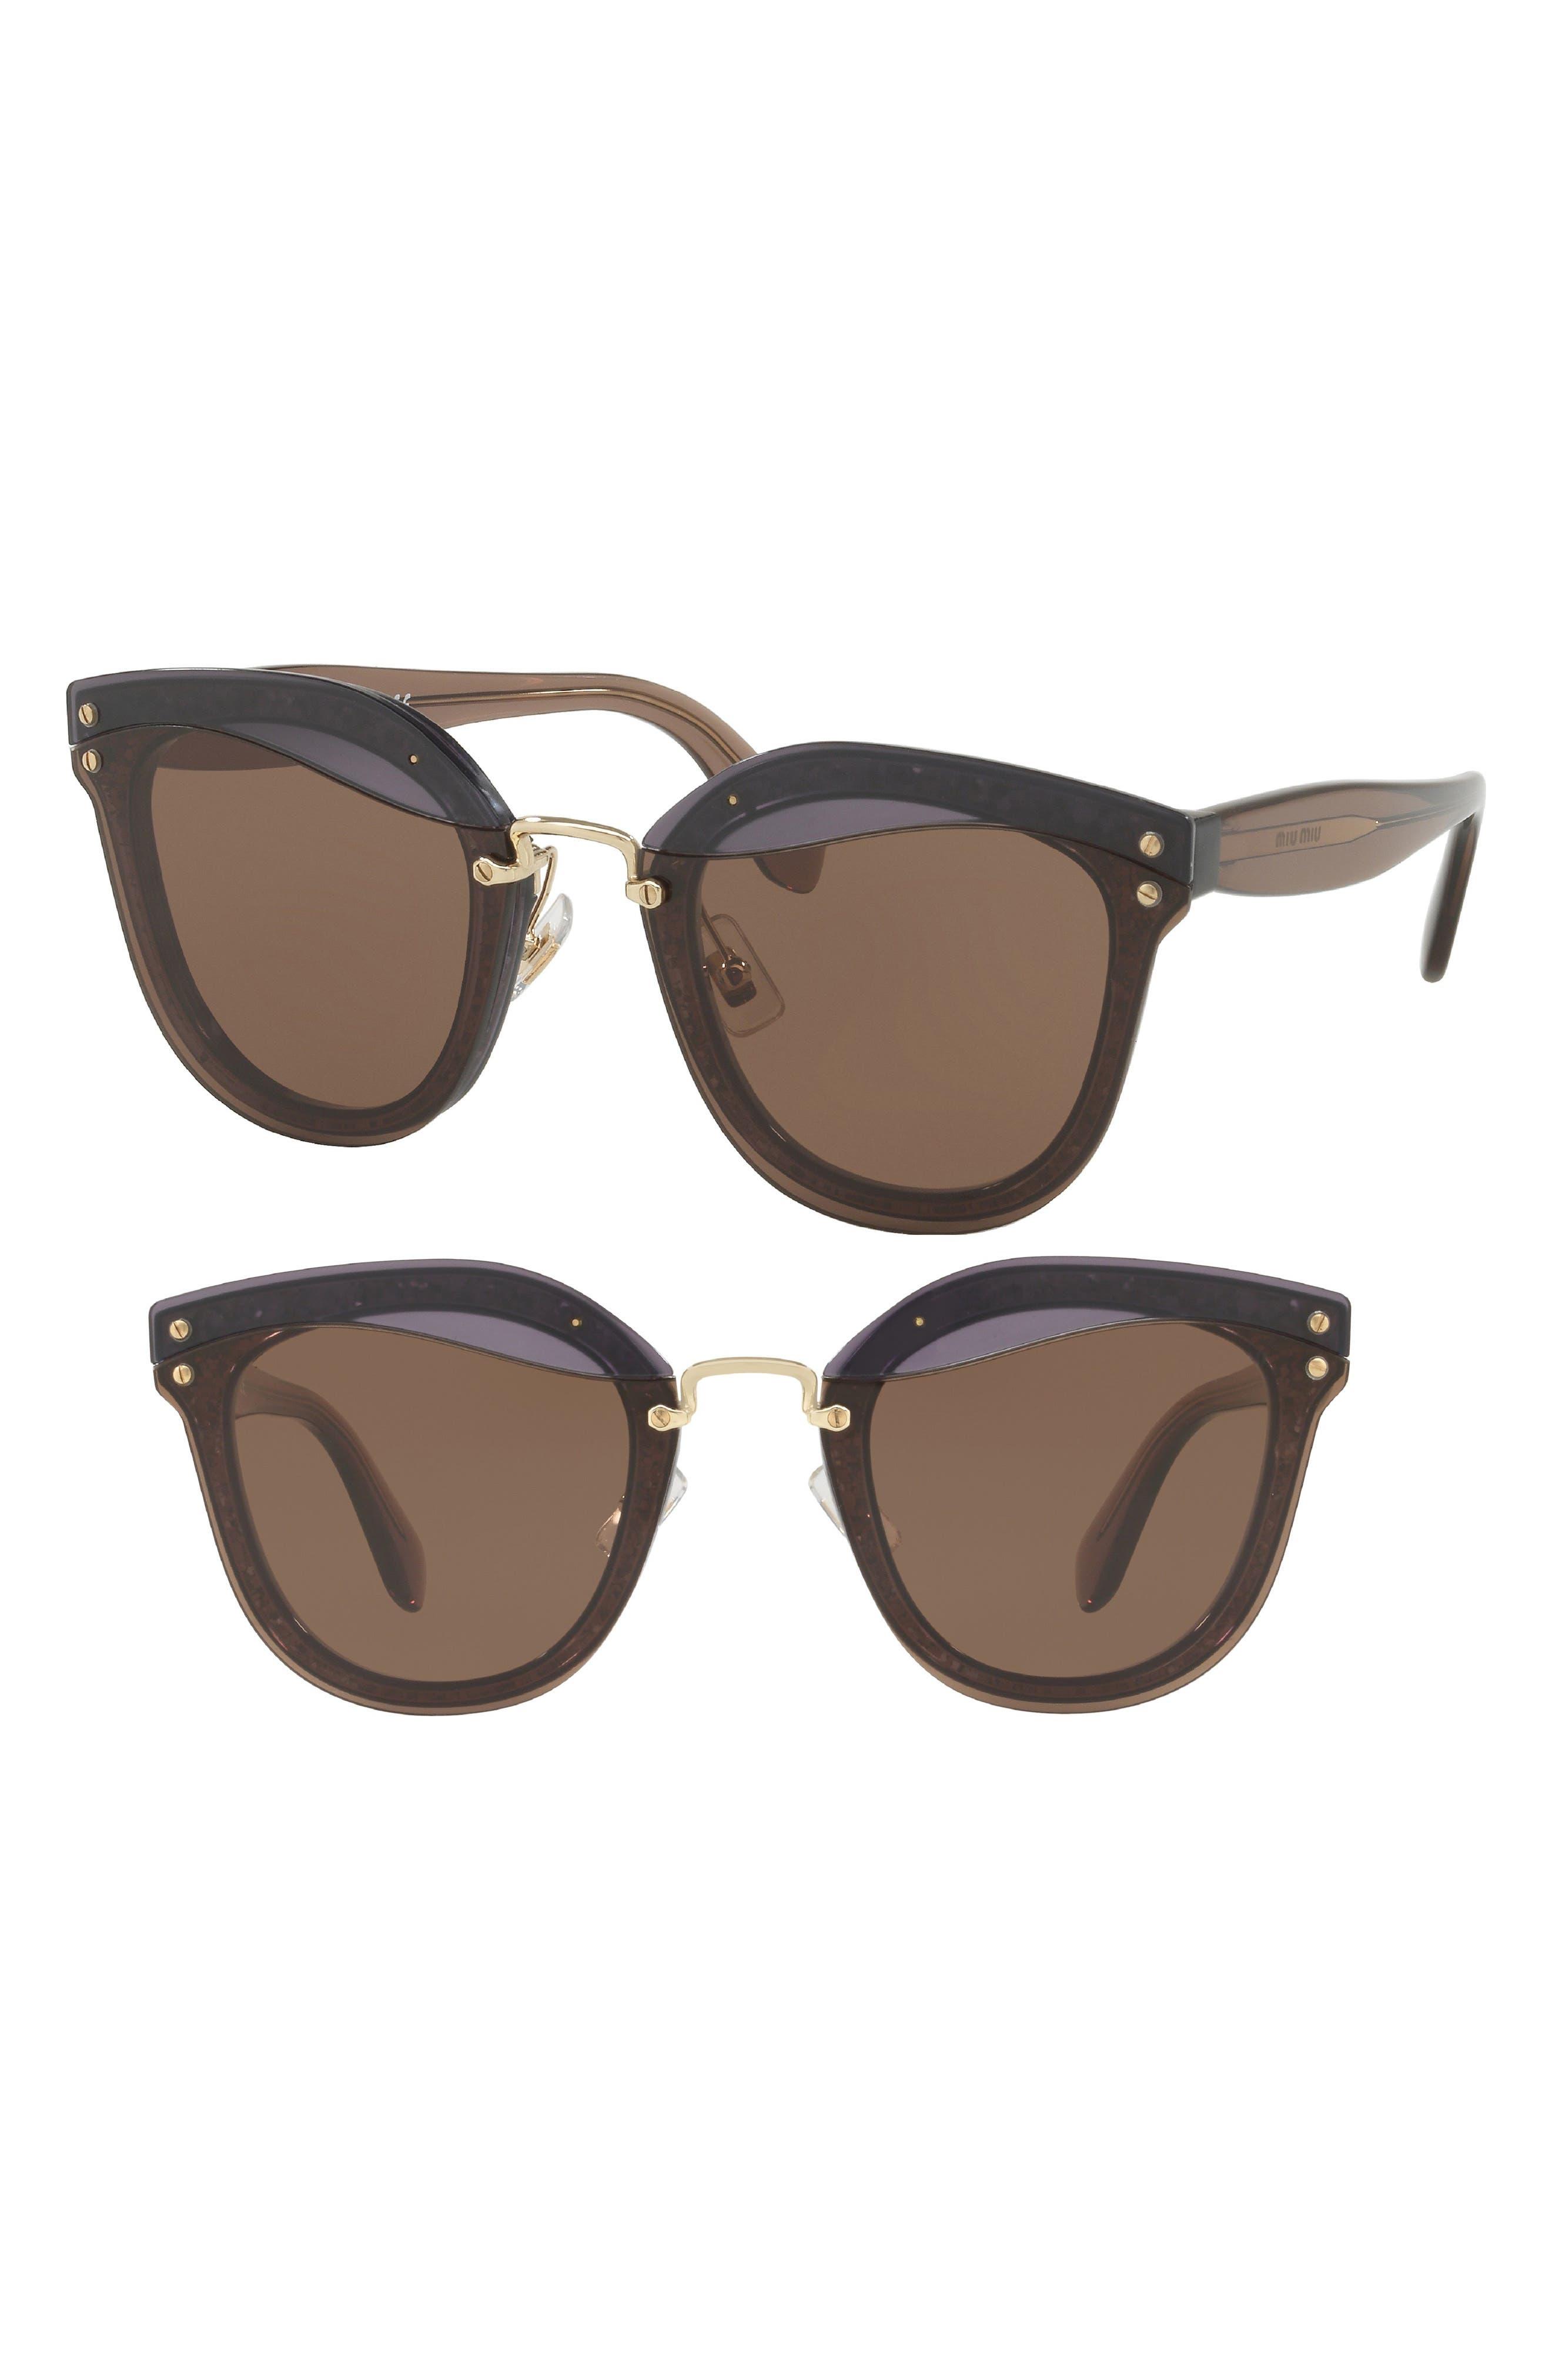 bffefeec2838 Miu Miu Sunglasses for Women